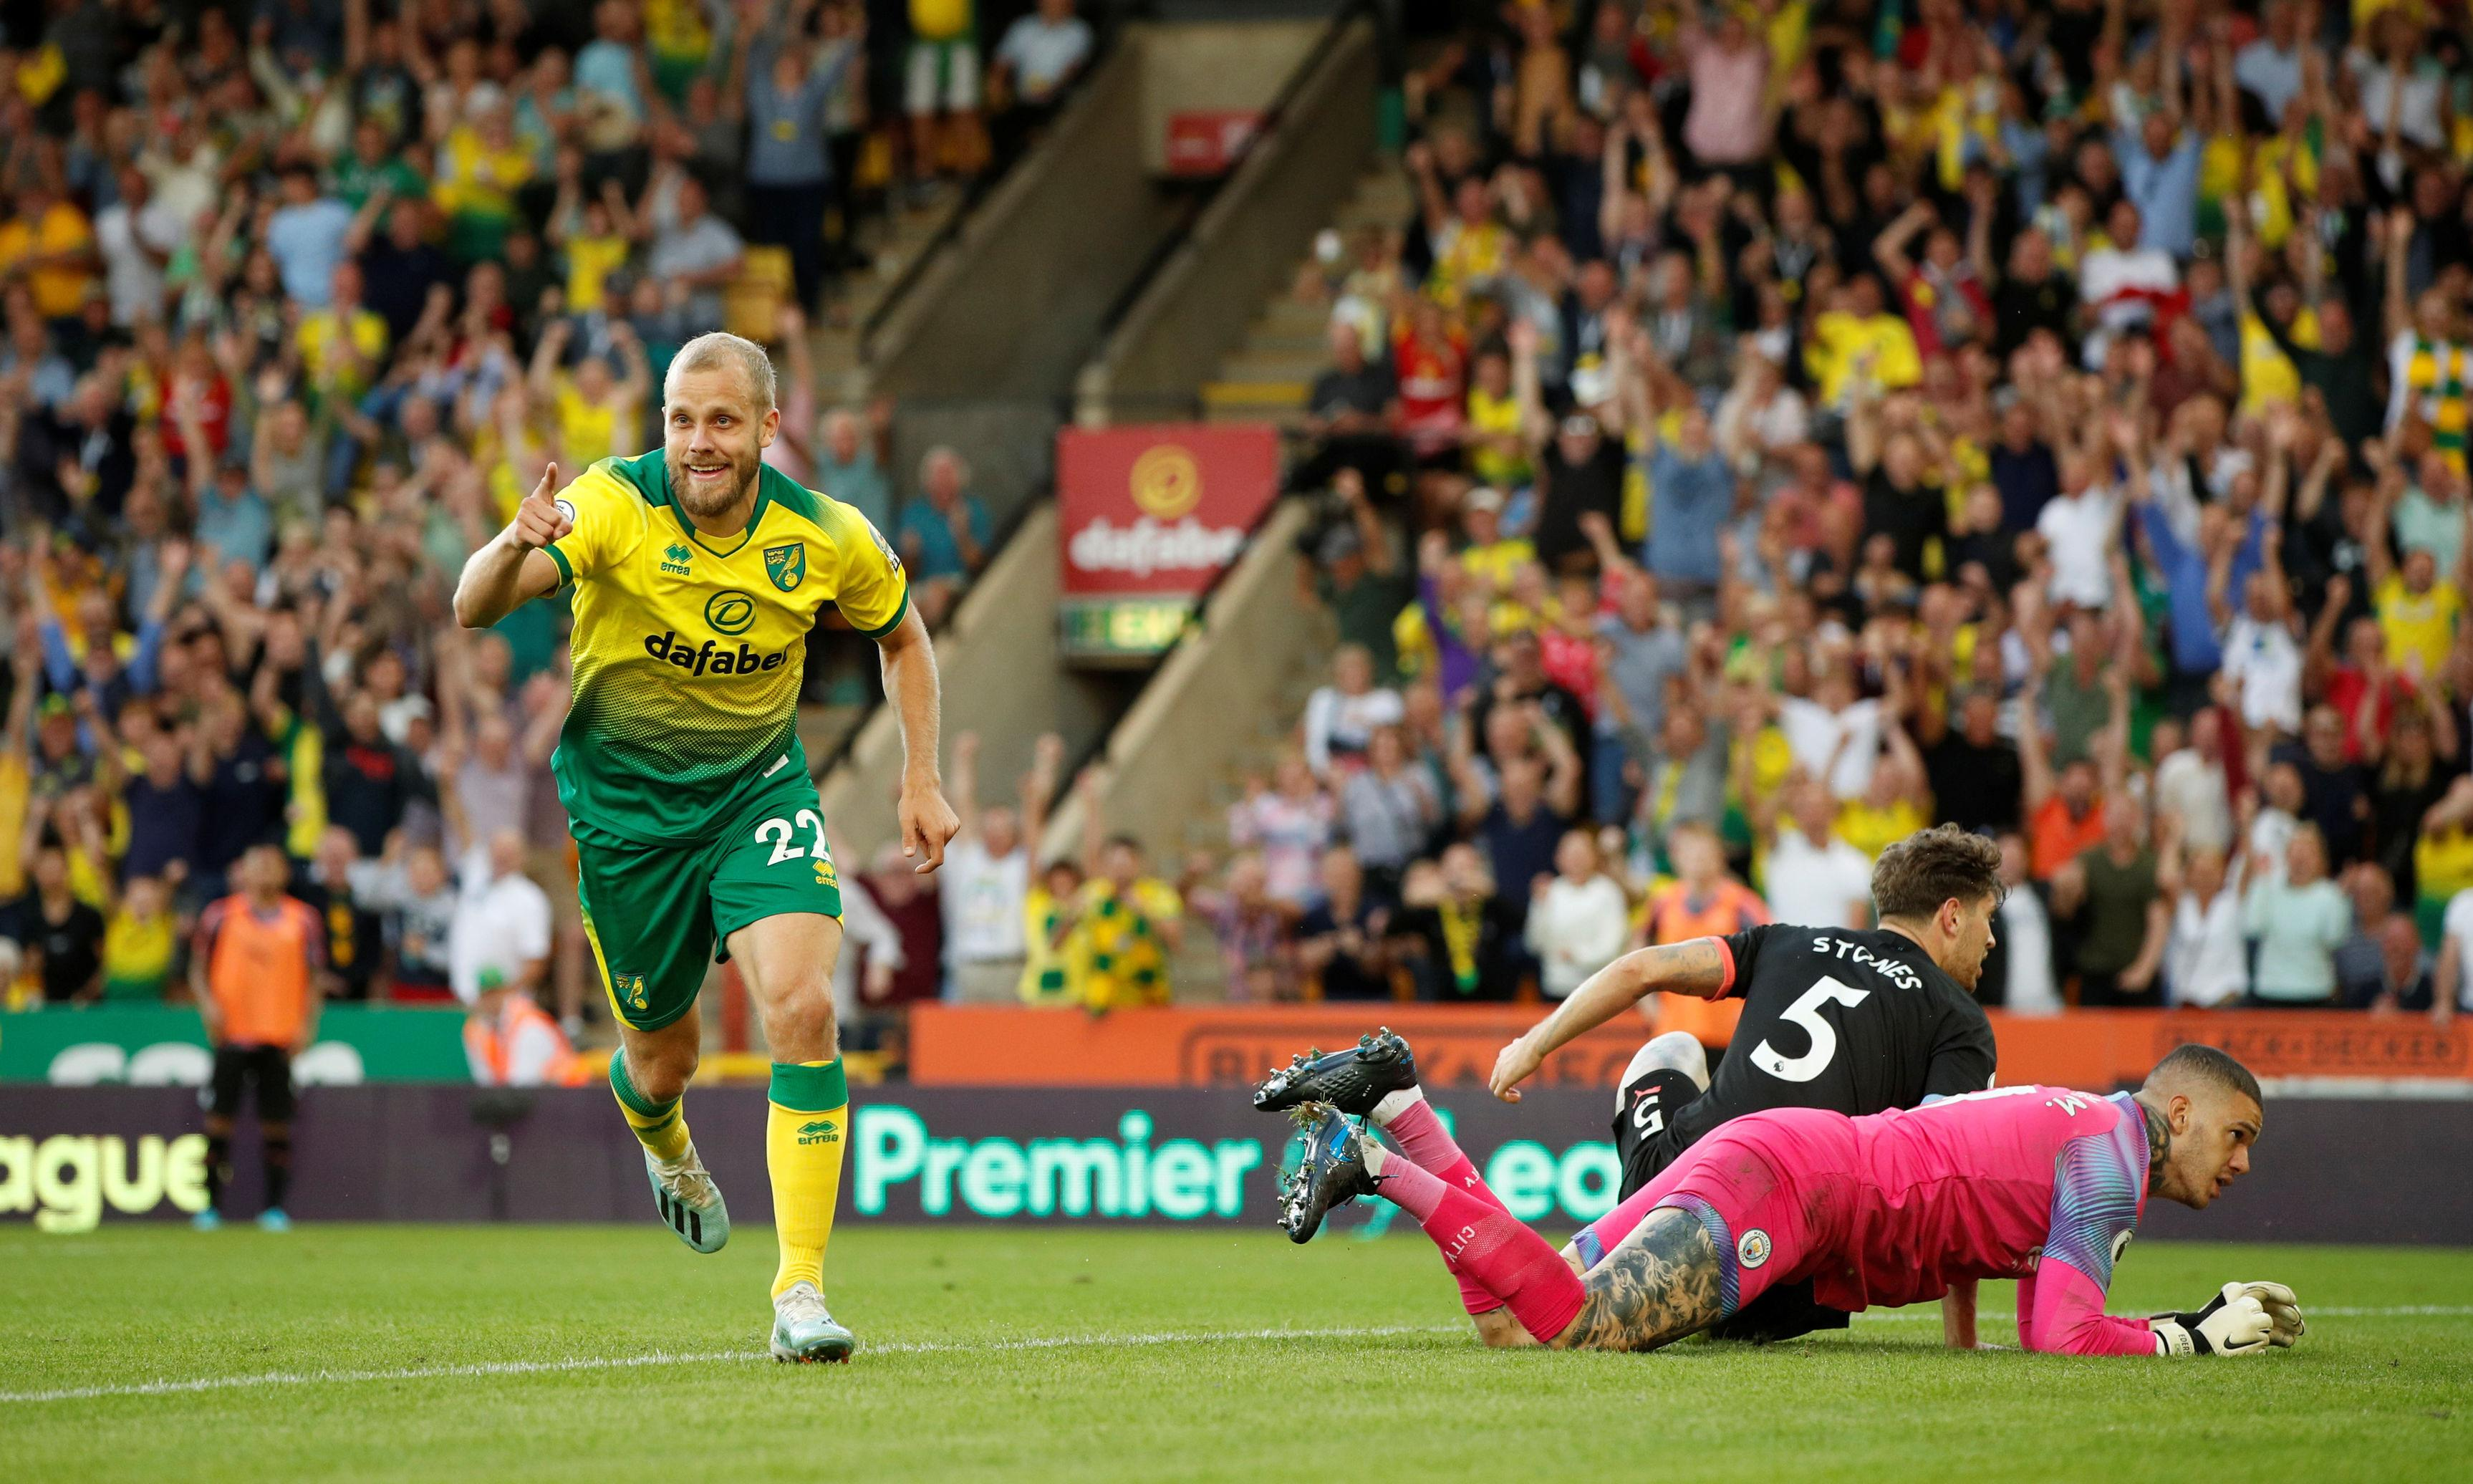 Teemu Pukki strikes again to seal Norwich's shock win over Man City